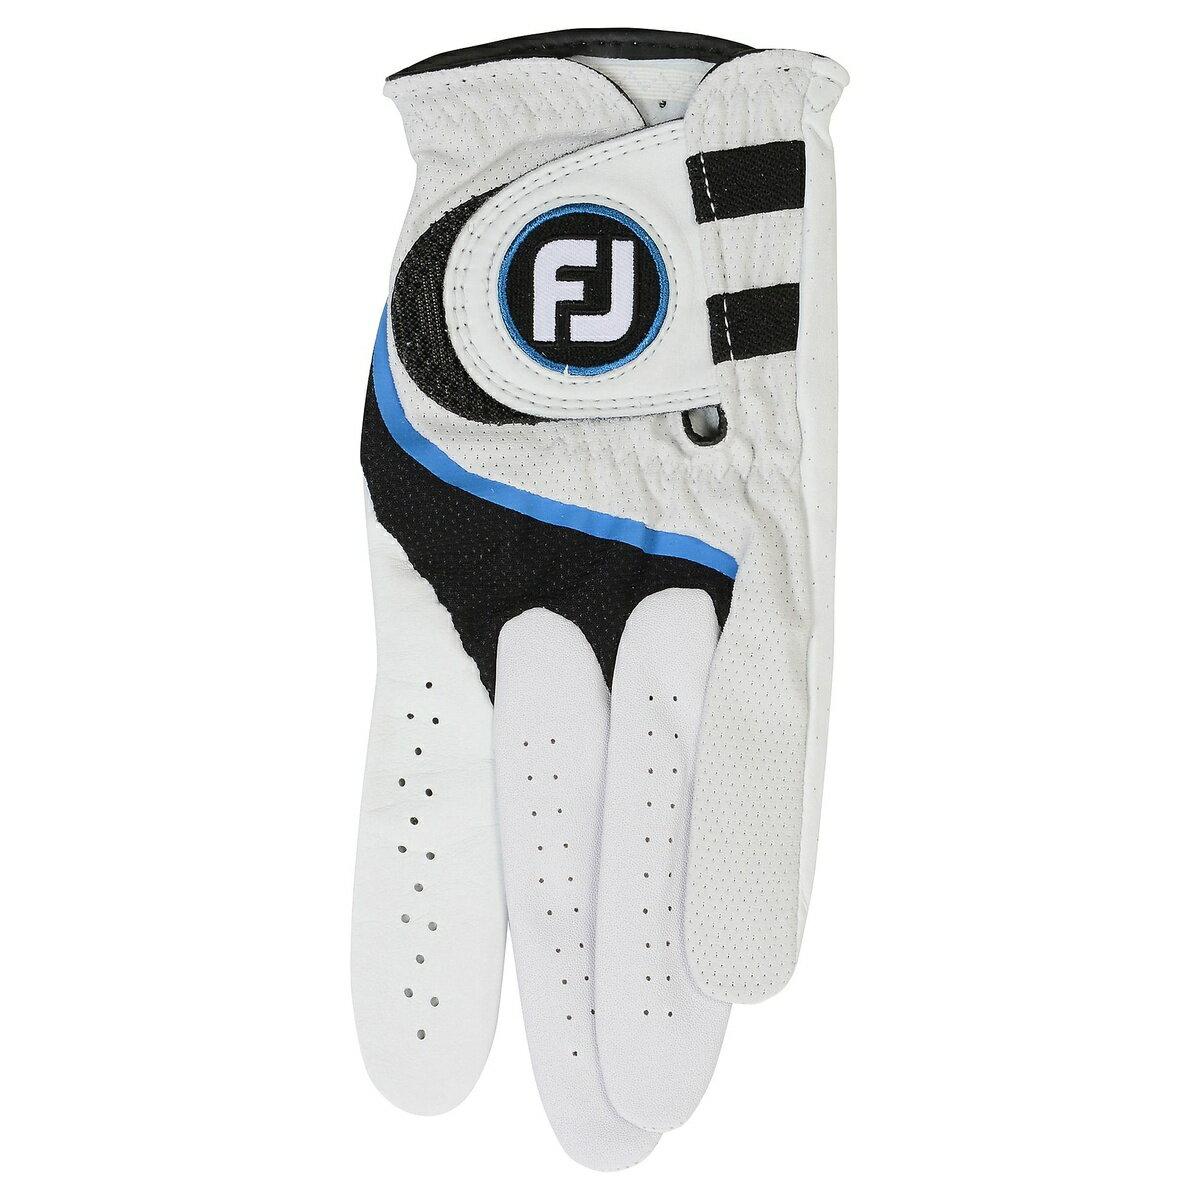 FOOTJOY (フットジョイ) ゴルフ メンズゴルフグローブ 19 プロフレックス WT/BK メンズ WHT FGPFWT